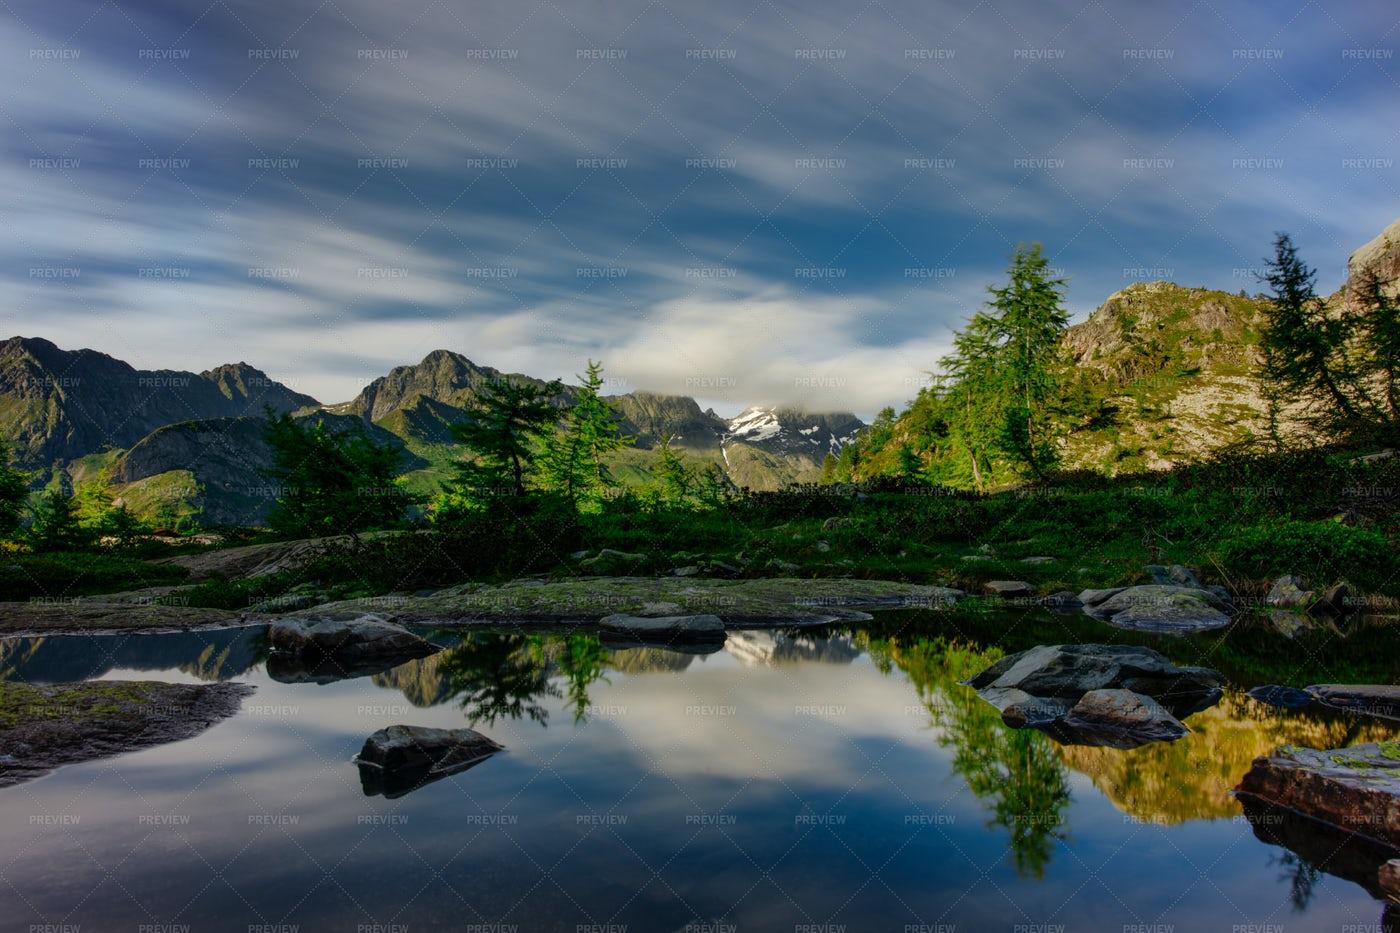 Water Mirror In Mountain Landscape: Stock Photos